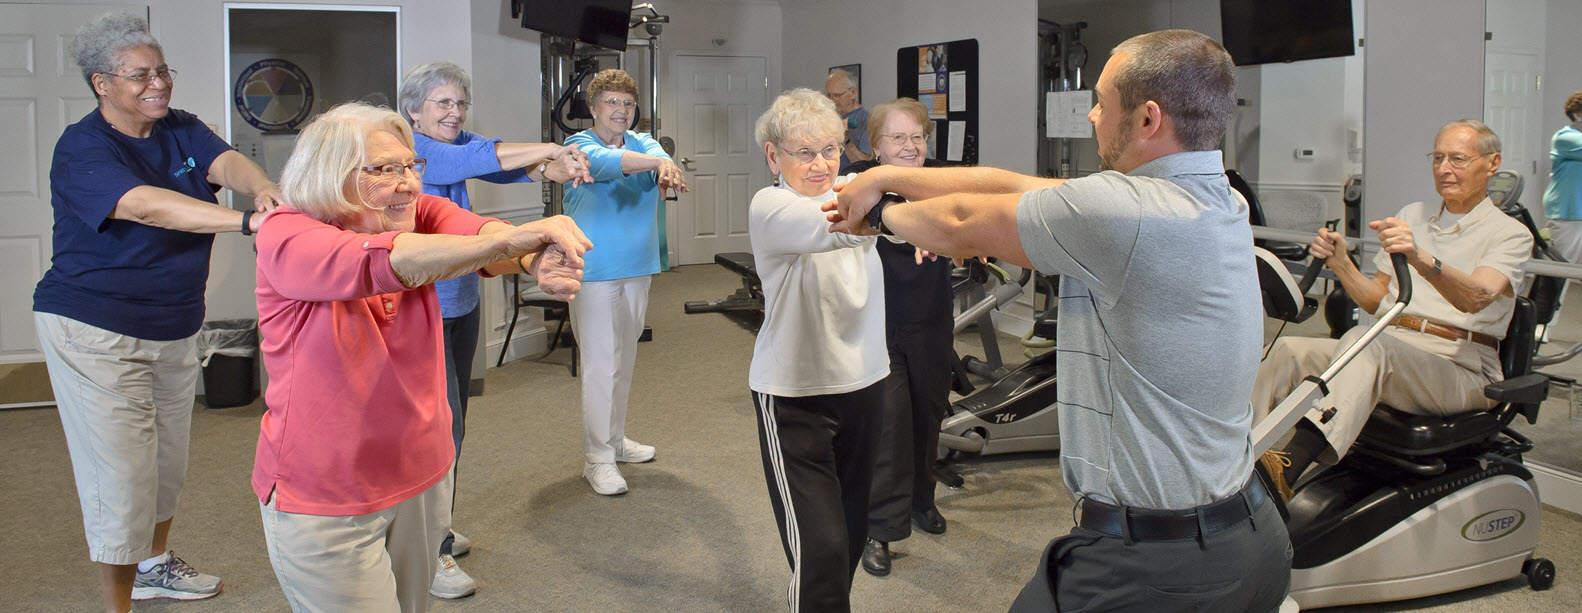 senior living fitness class